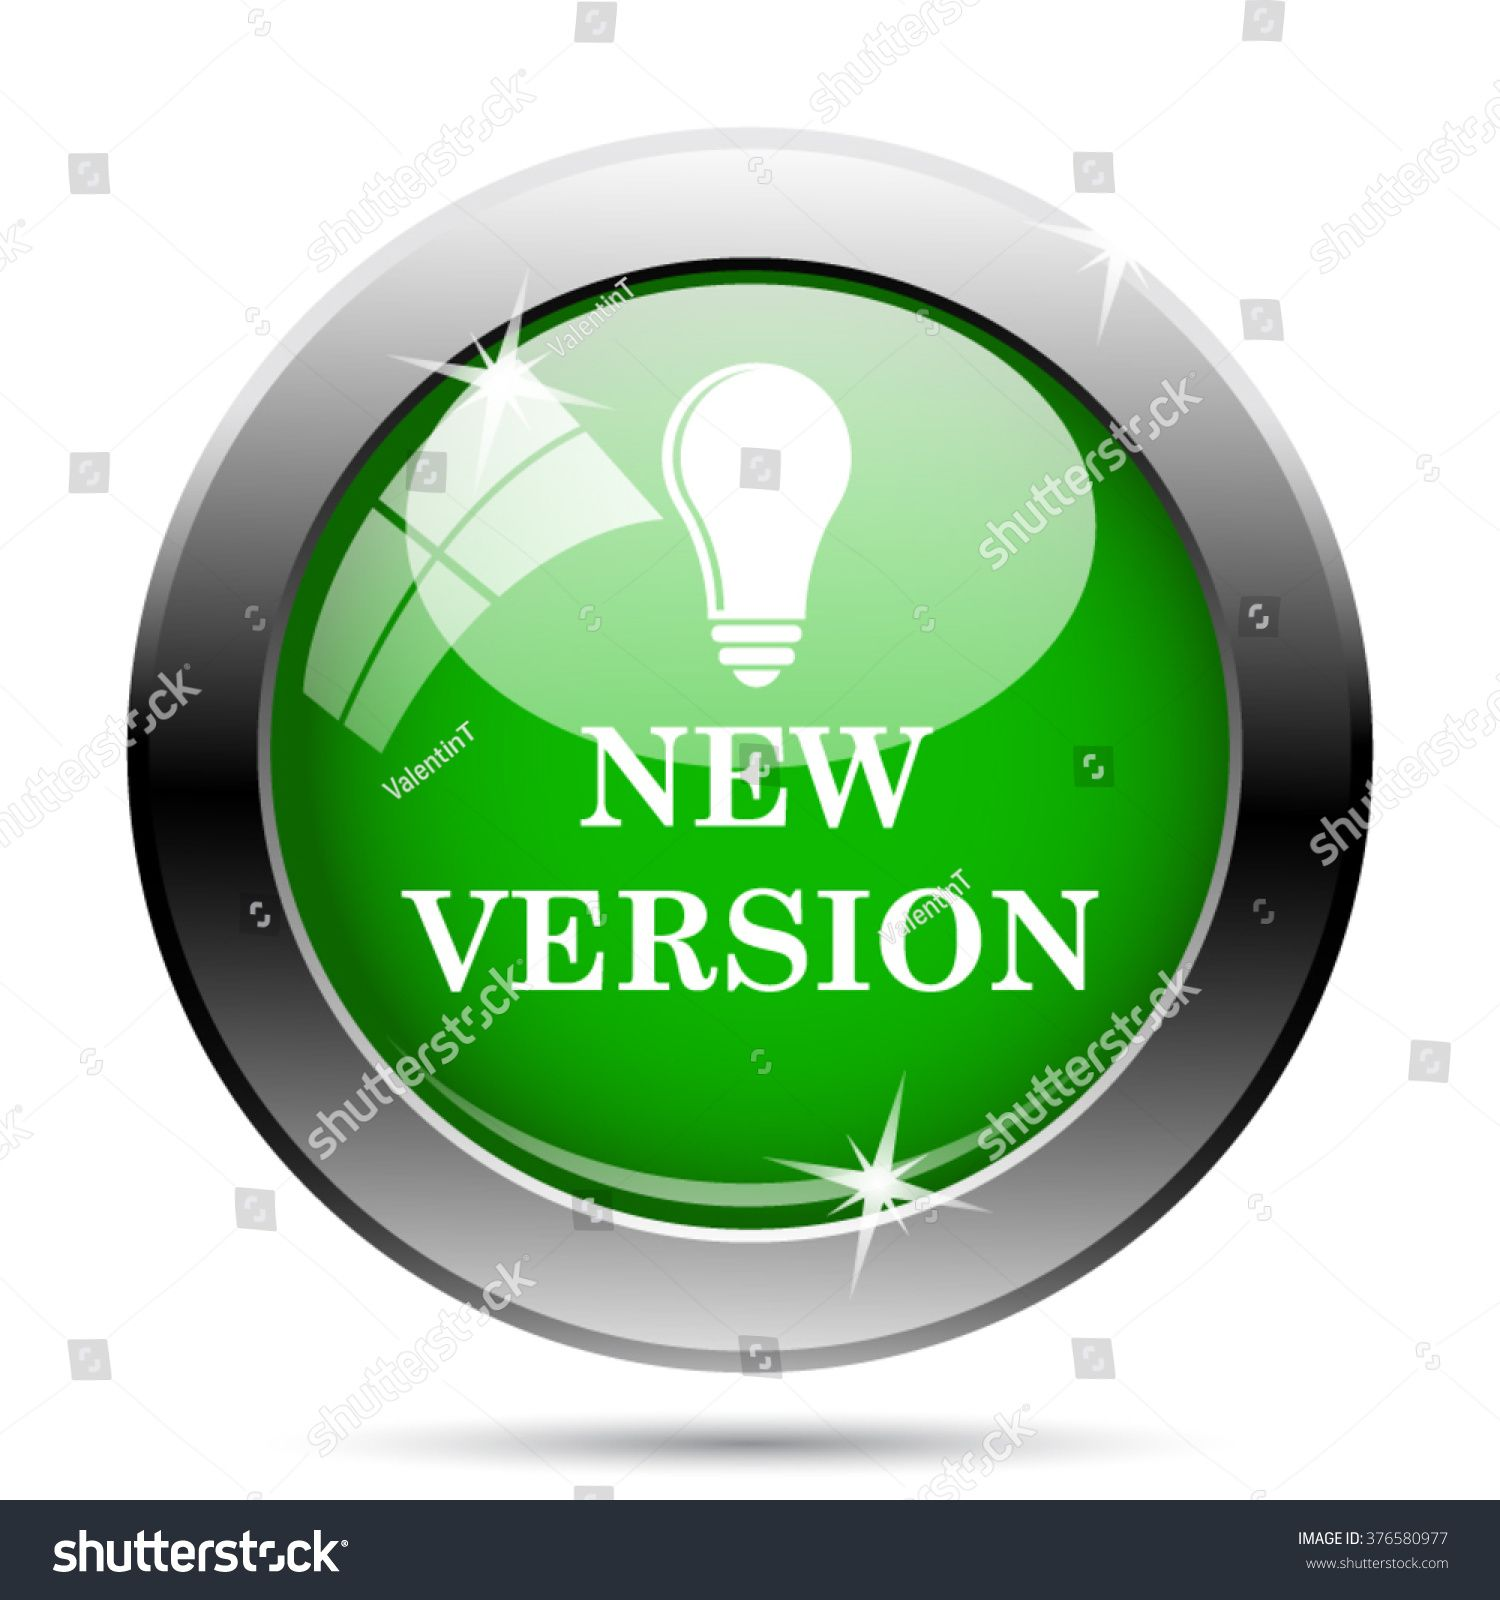 New version icon. button on white background